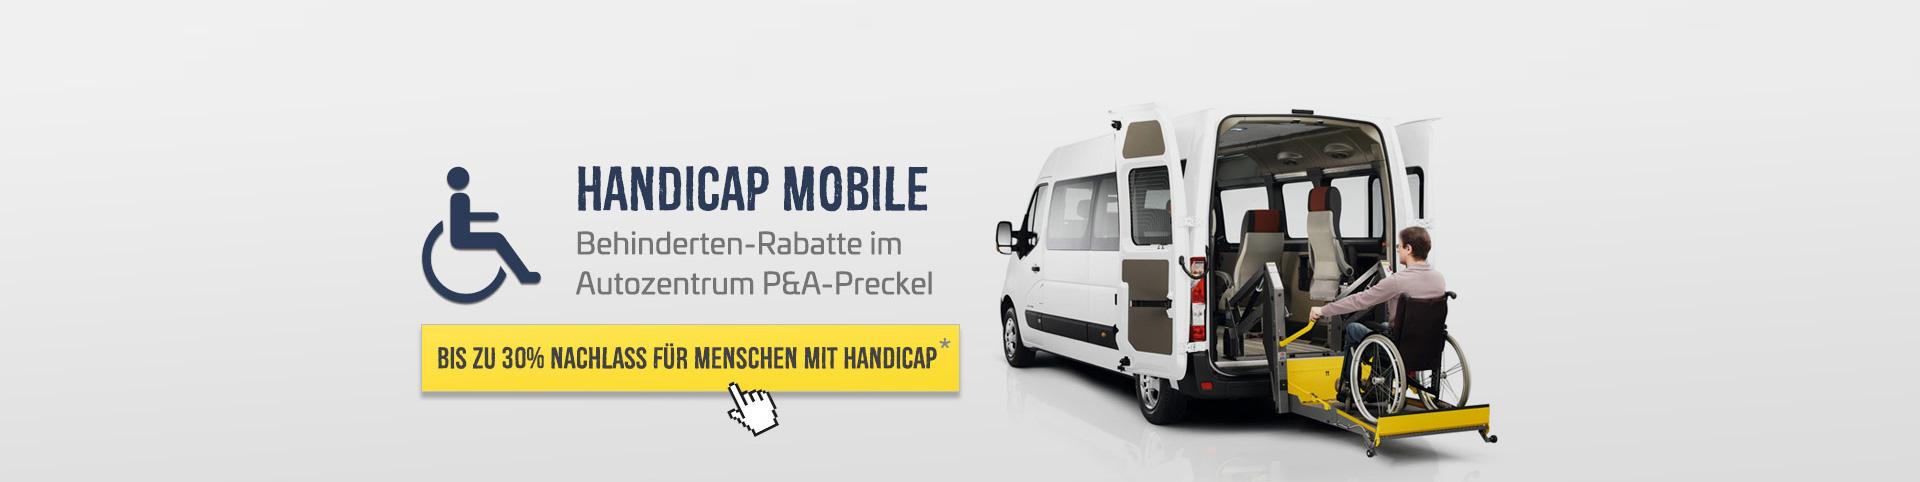 Renault Behindertenrabatt